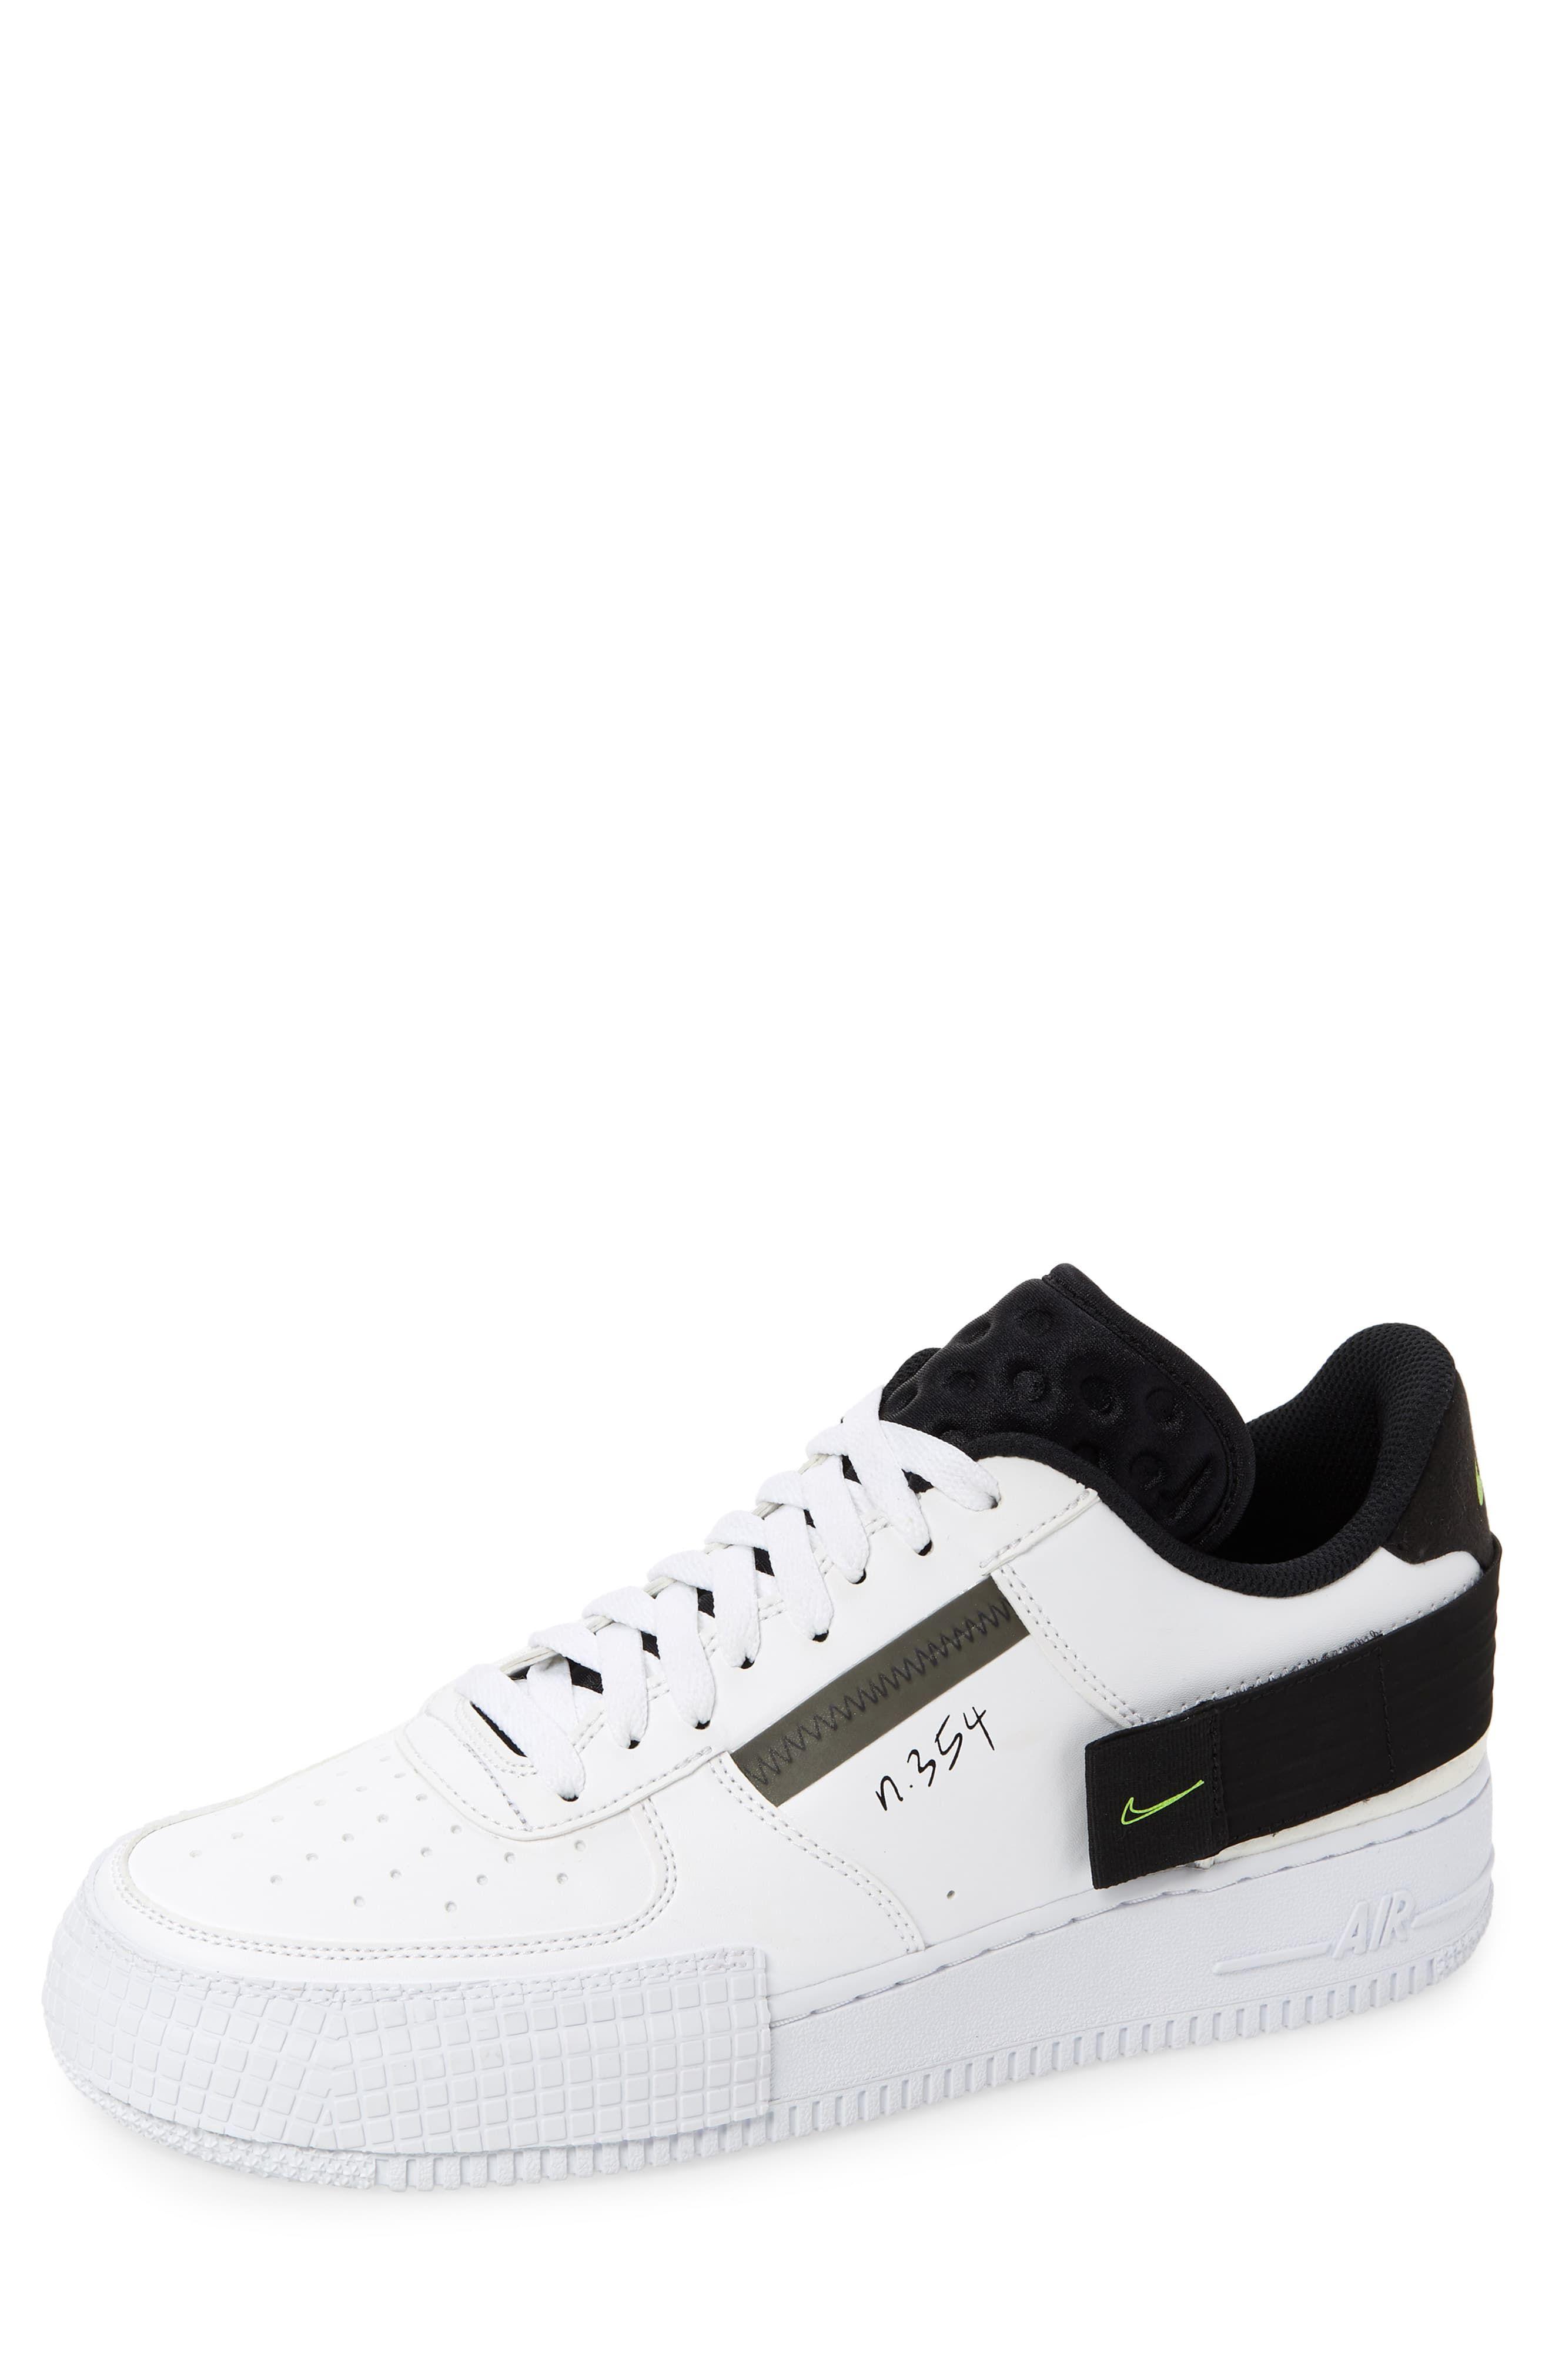 Men's Nike Air Force 1 Low Type Sneaker, Size 7.5 M Black